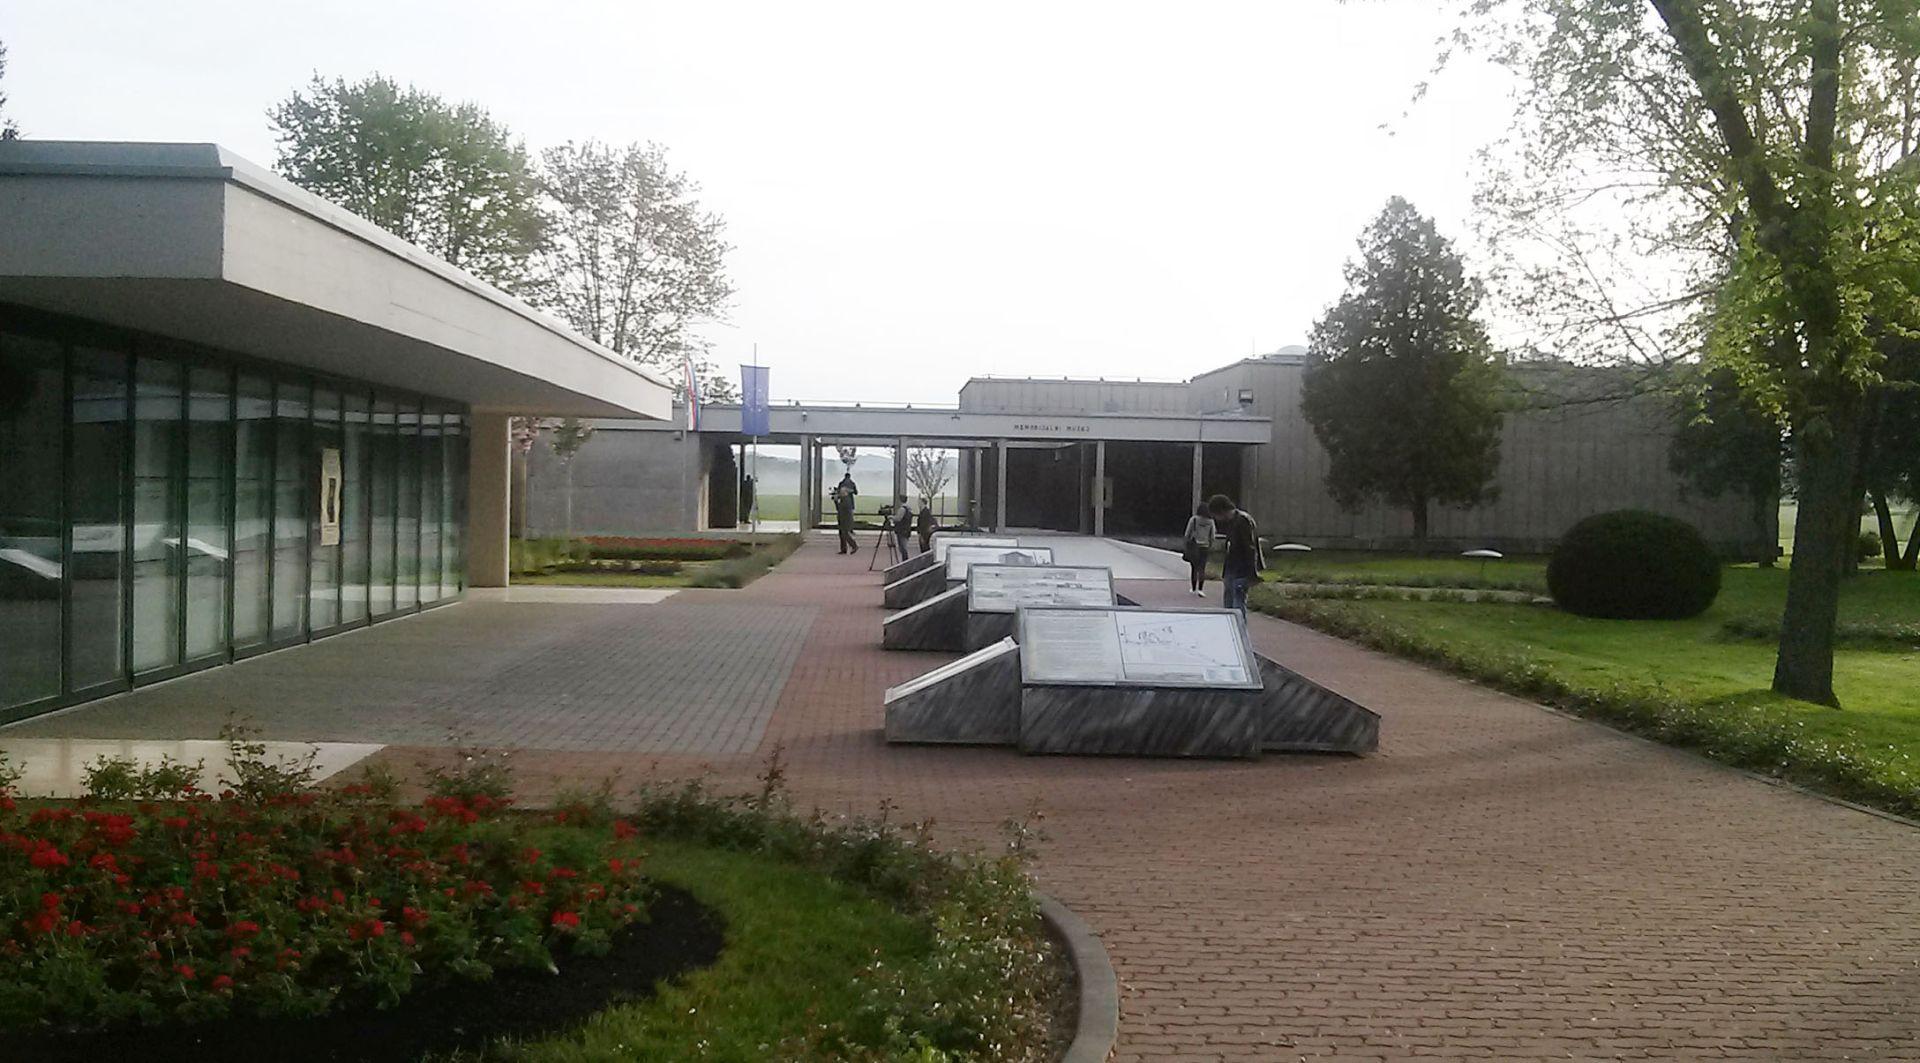 Memorijalni muzej u Jasenovcu. foto HINA / Marina BUJAN / mm